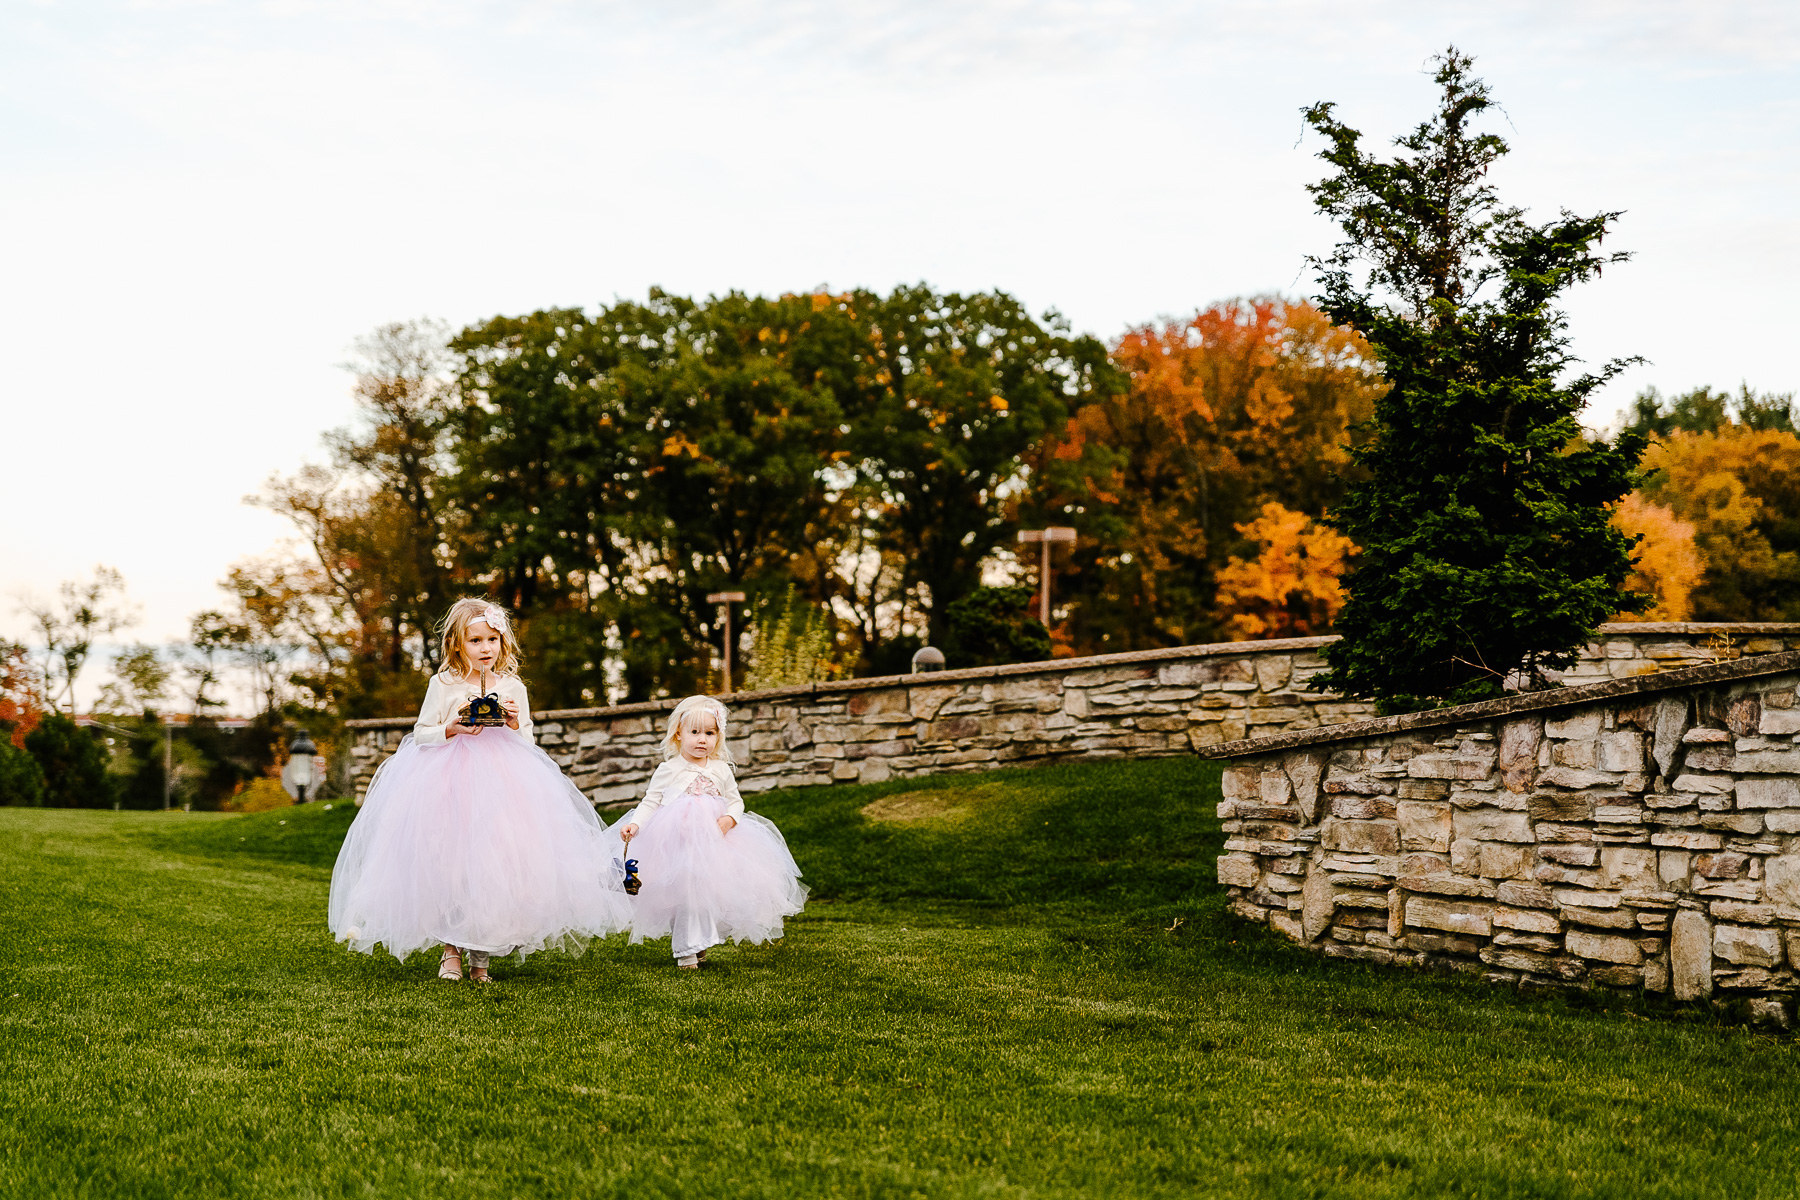 71-Laurita Winery Wedding New Jersey Wedding Photographer Laurita Winery Weddings Longbrook Photography.jpg